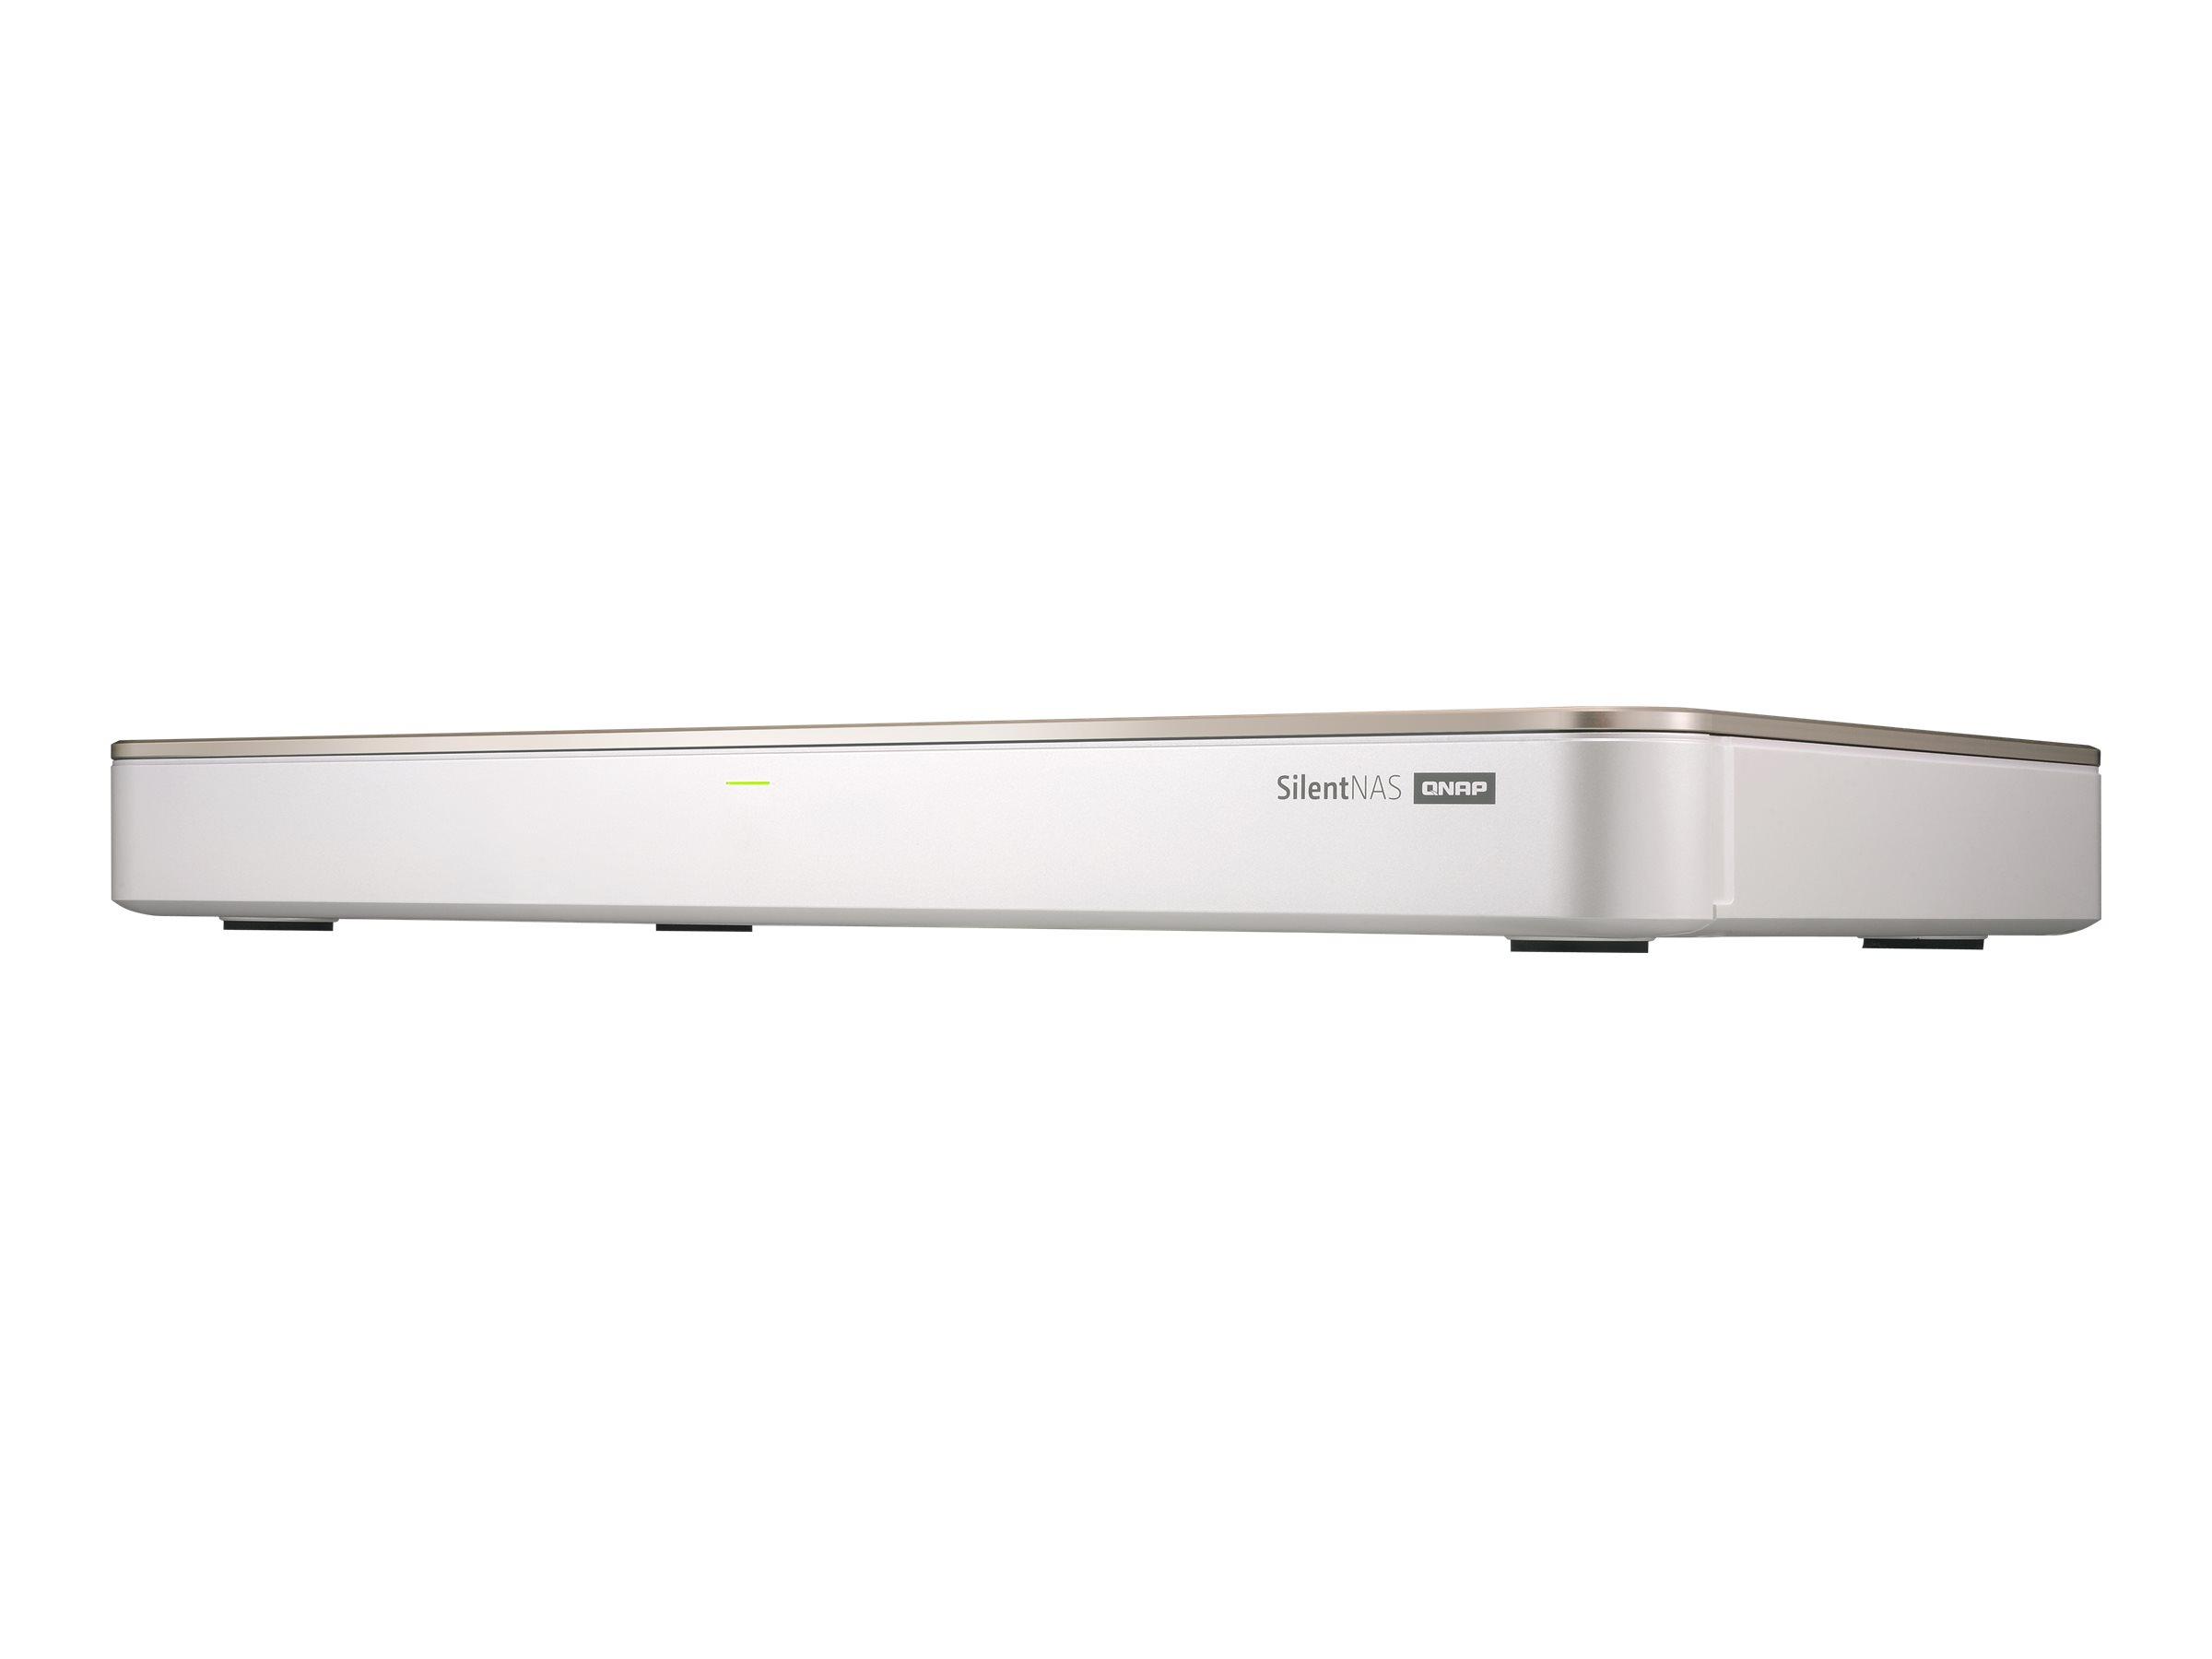 QNAP HS-453DX-8G - NAS-Server - 4 Schächte - SATA 6Gb/s - RAID 0, 1, 5, 6, 10, JBOD, 5 Hot Spare, 6 Hot Spare, 10-Hot-Spare - RA